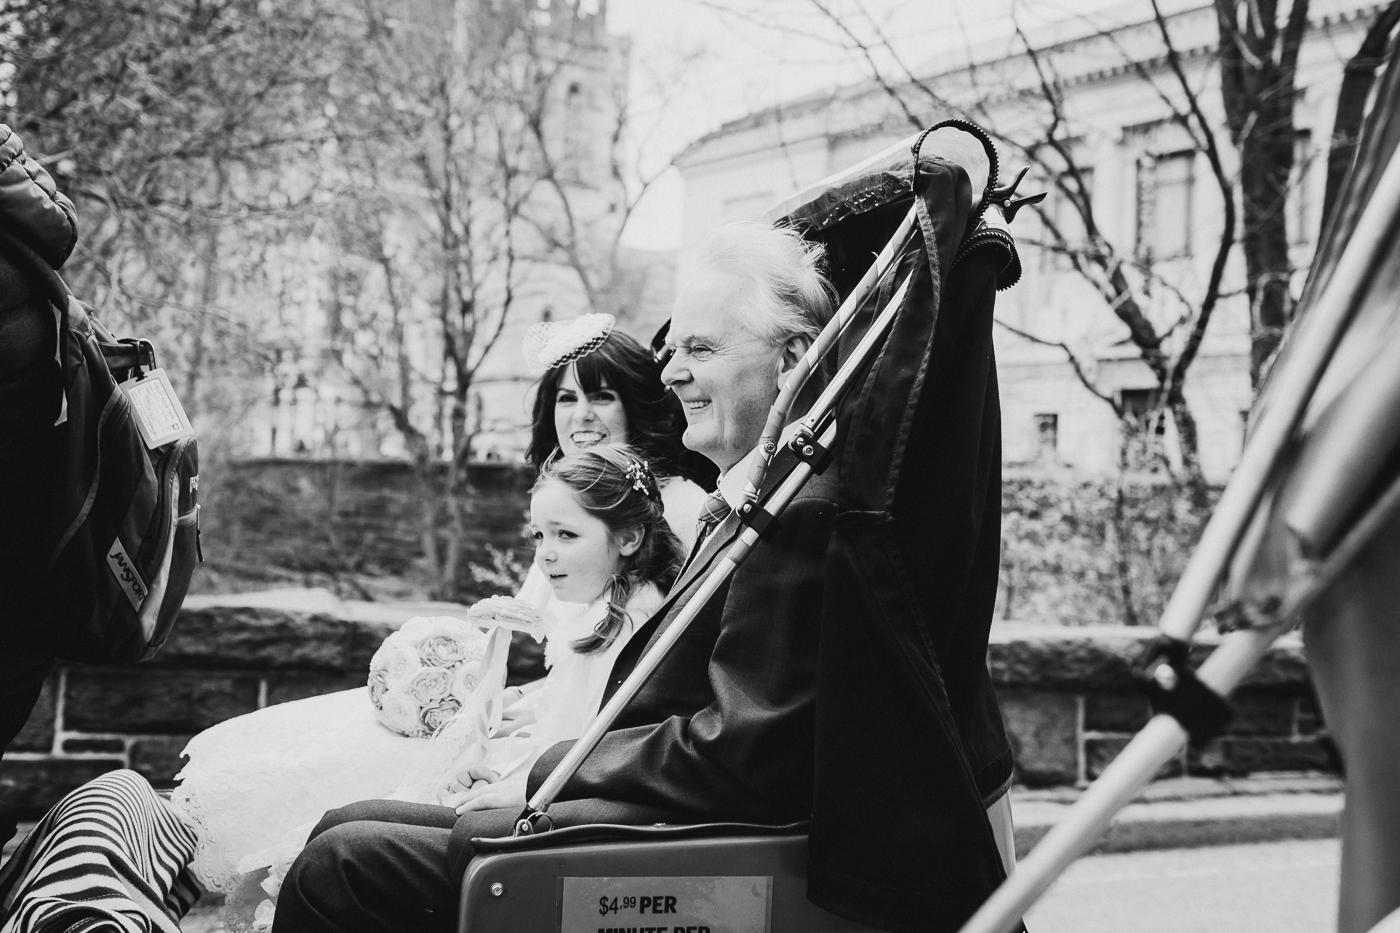 Ladies-Pavilion-Central-Park-NYC-Documentary-Elopement-Wedding-Photographer-19.jpg